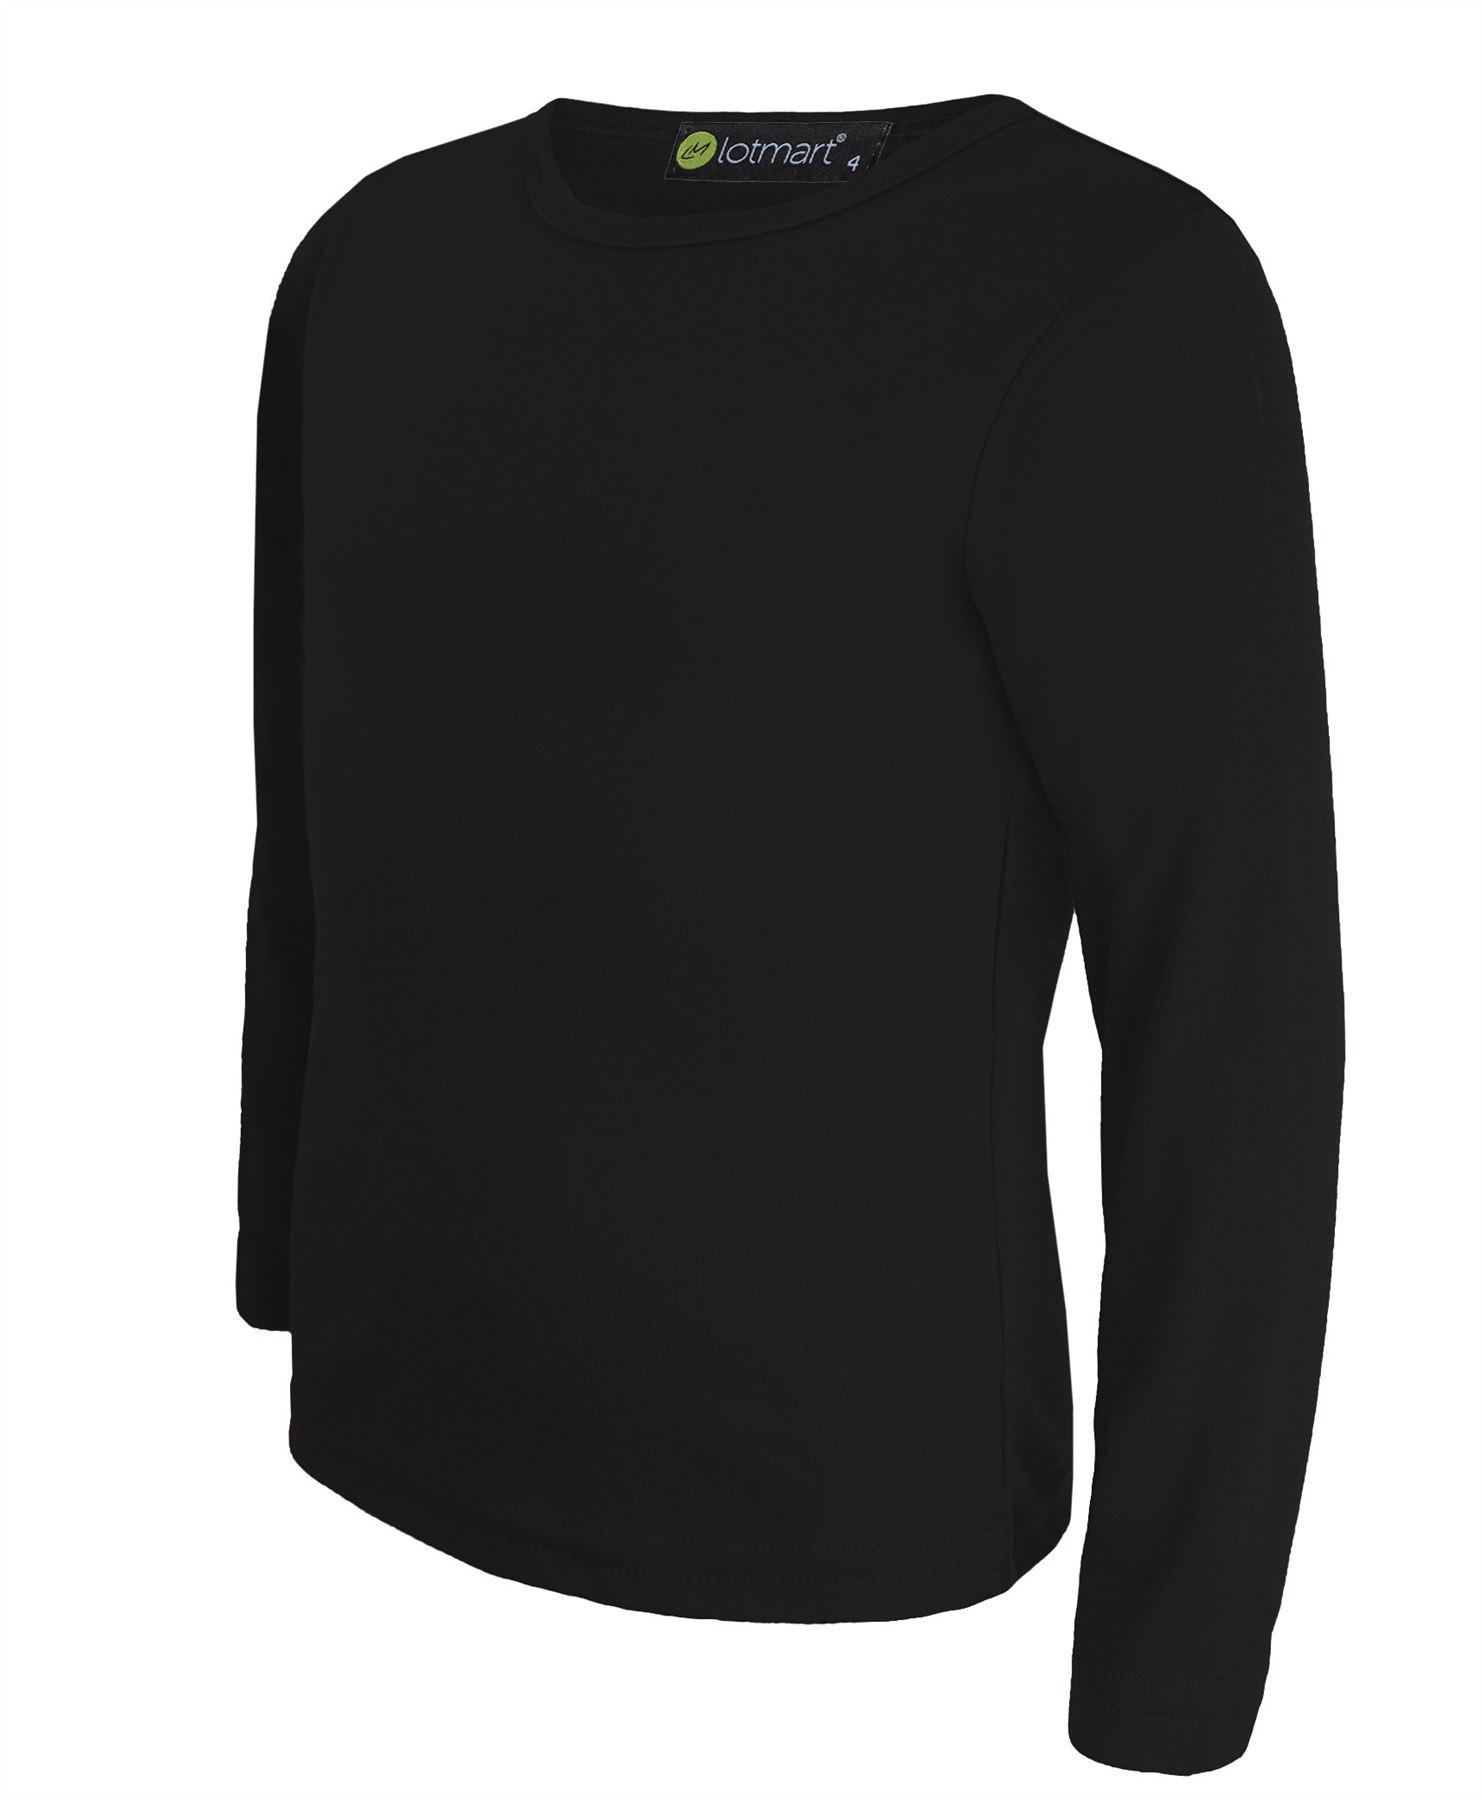 Kids Basic Top Plain Long Sleeve Boys Girls T Shirt Tops